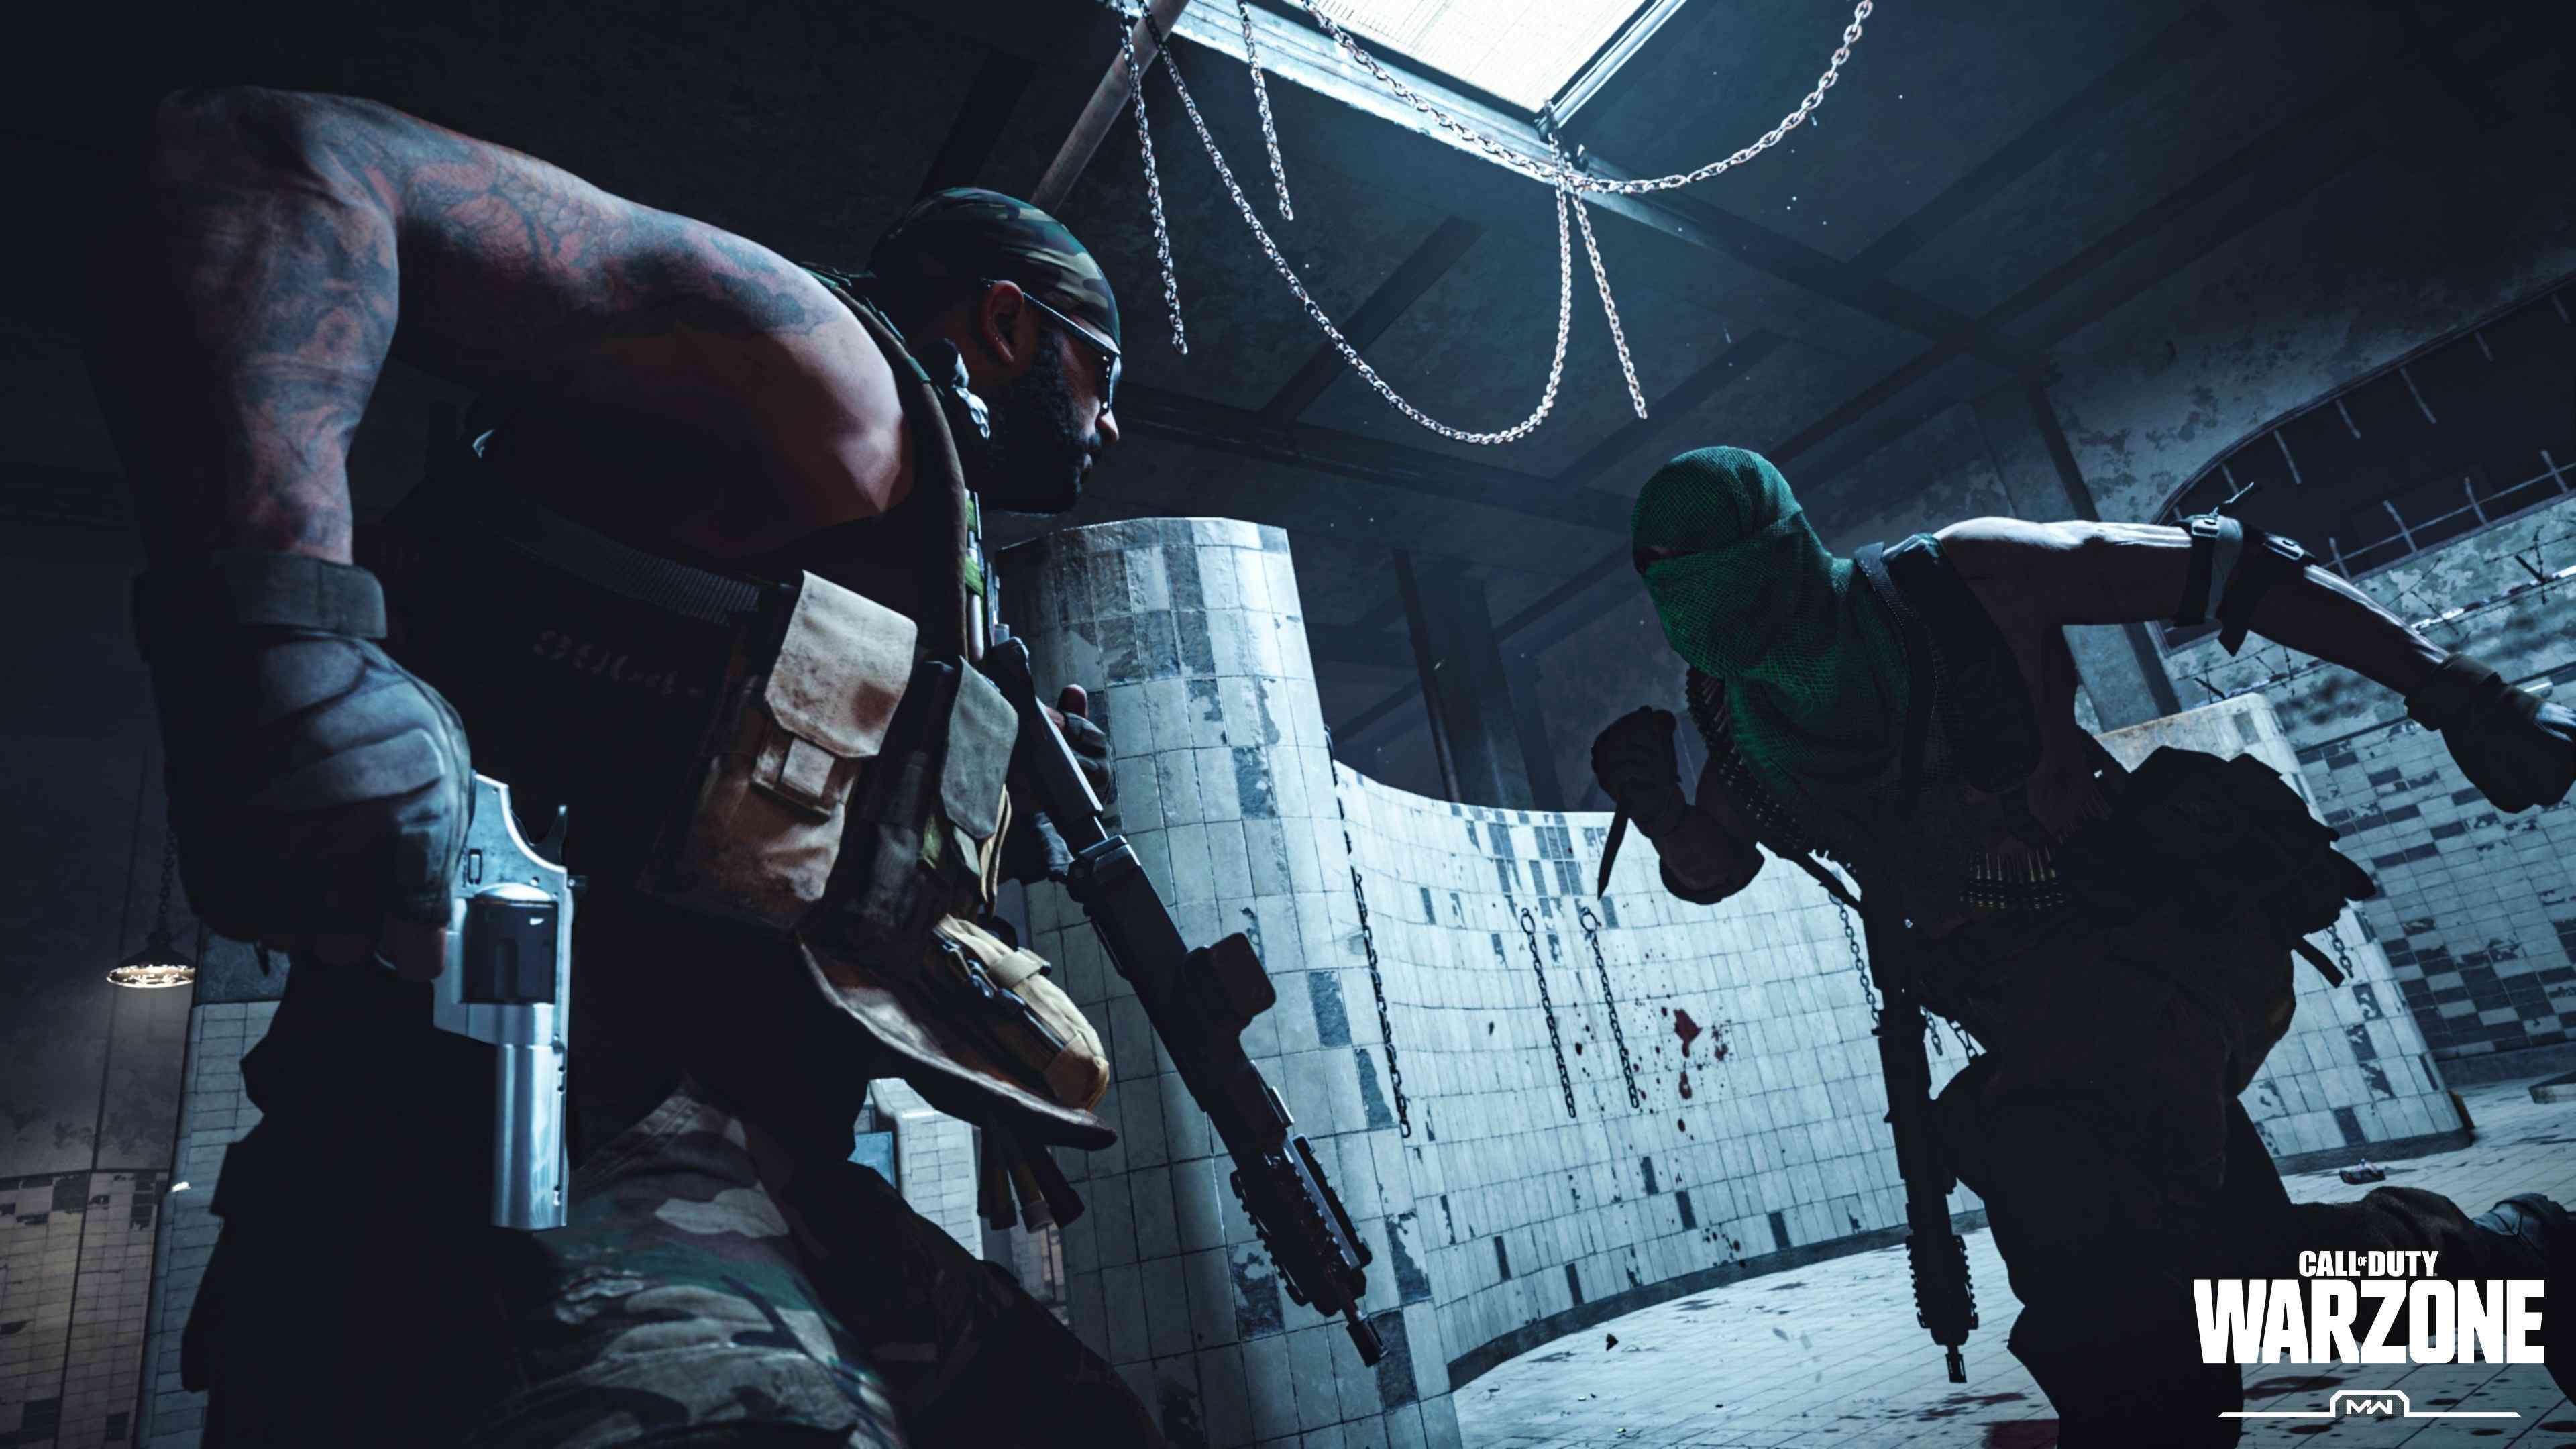 Call of Duty Warzone – Bild 5